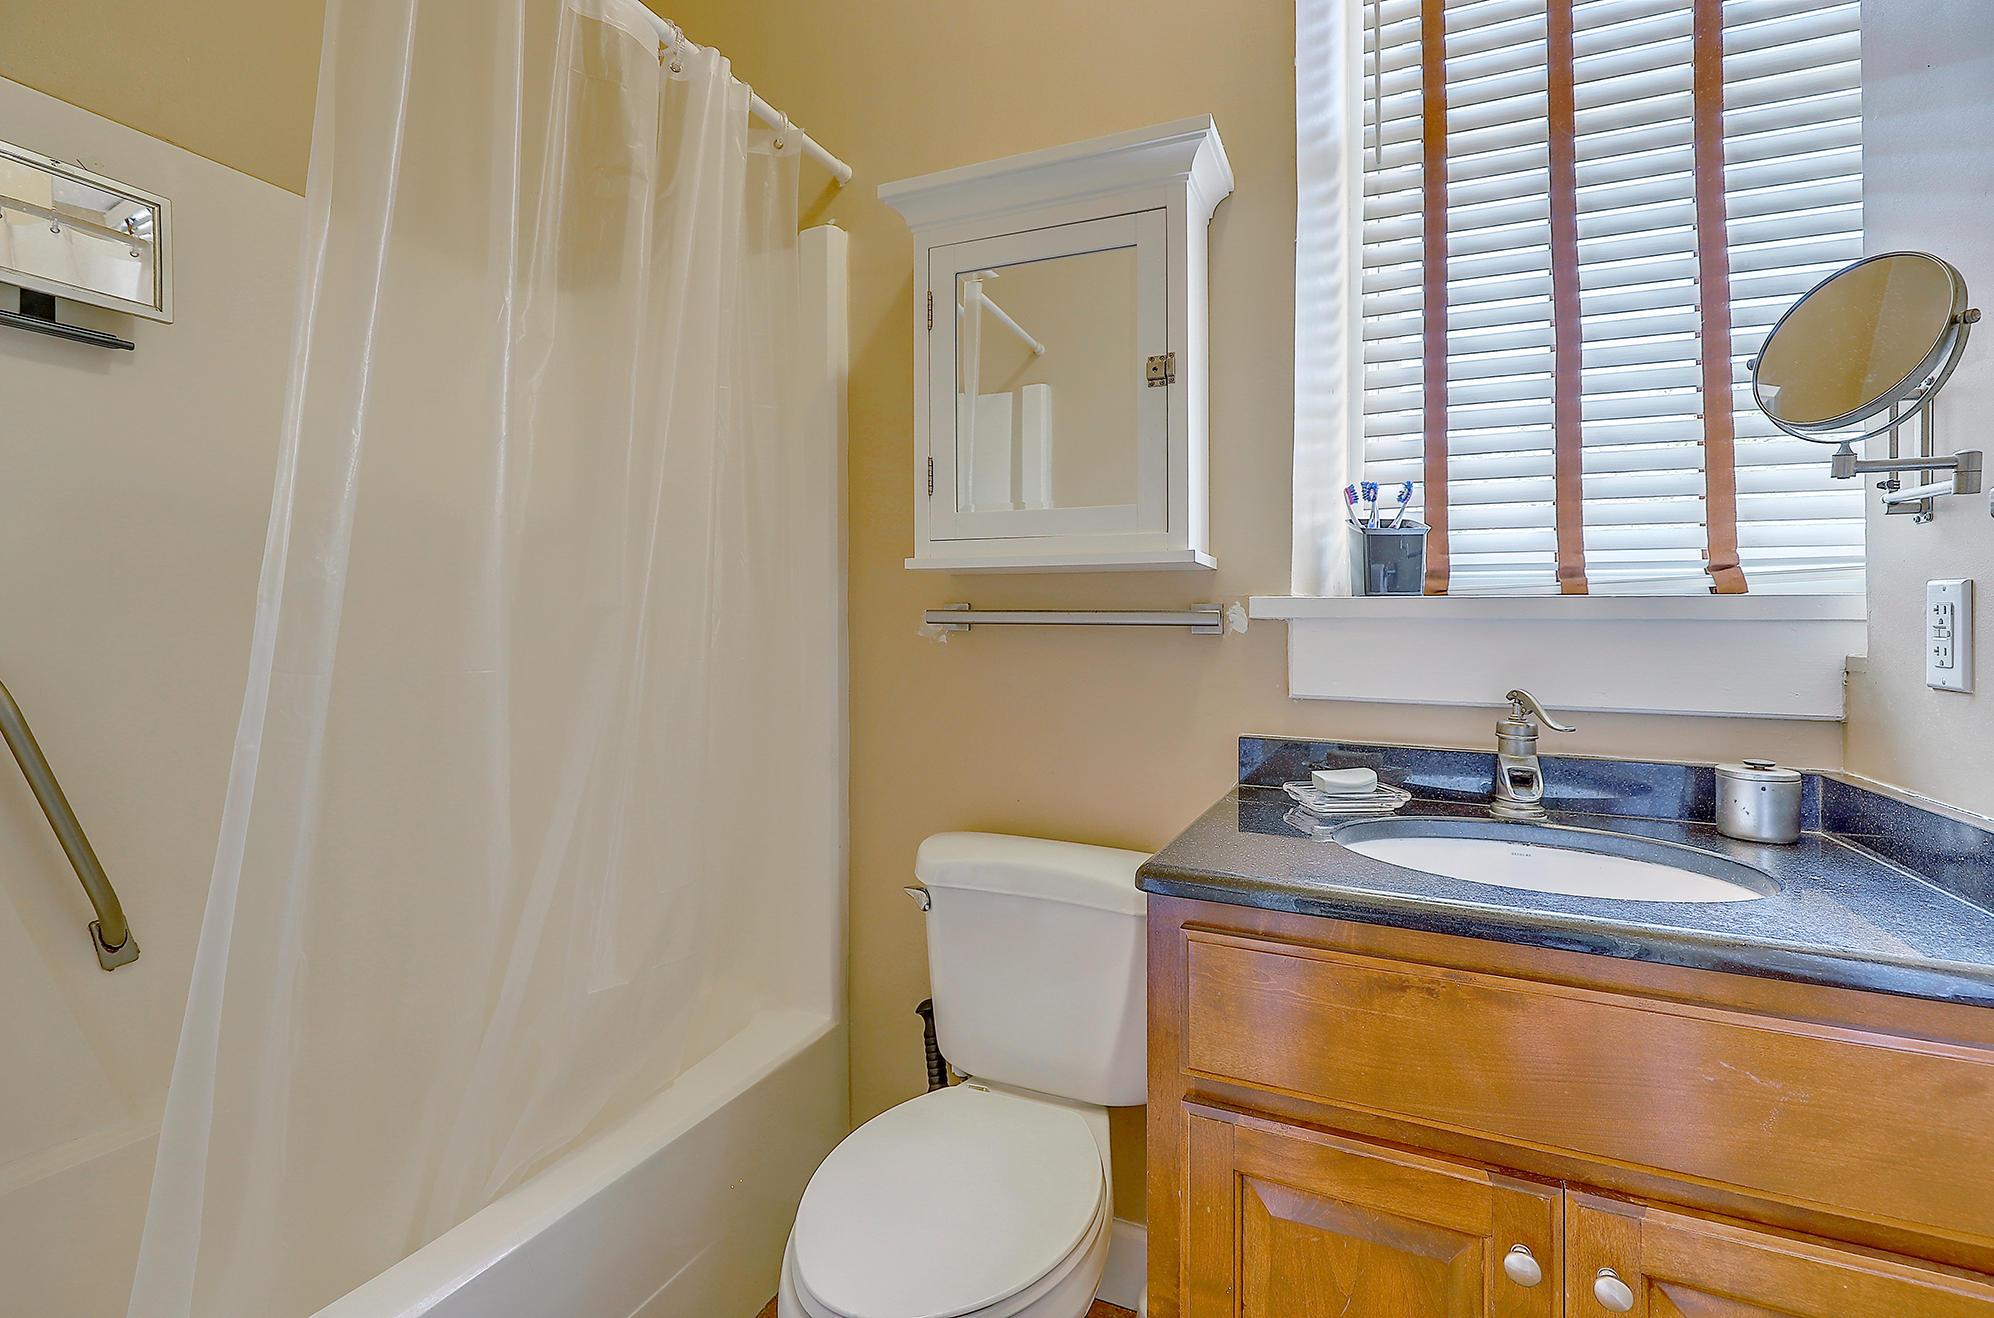 King Street Lofts Homes For Sale - 350 King, Charleston, SC - 5